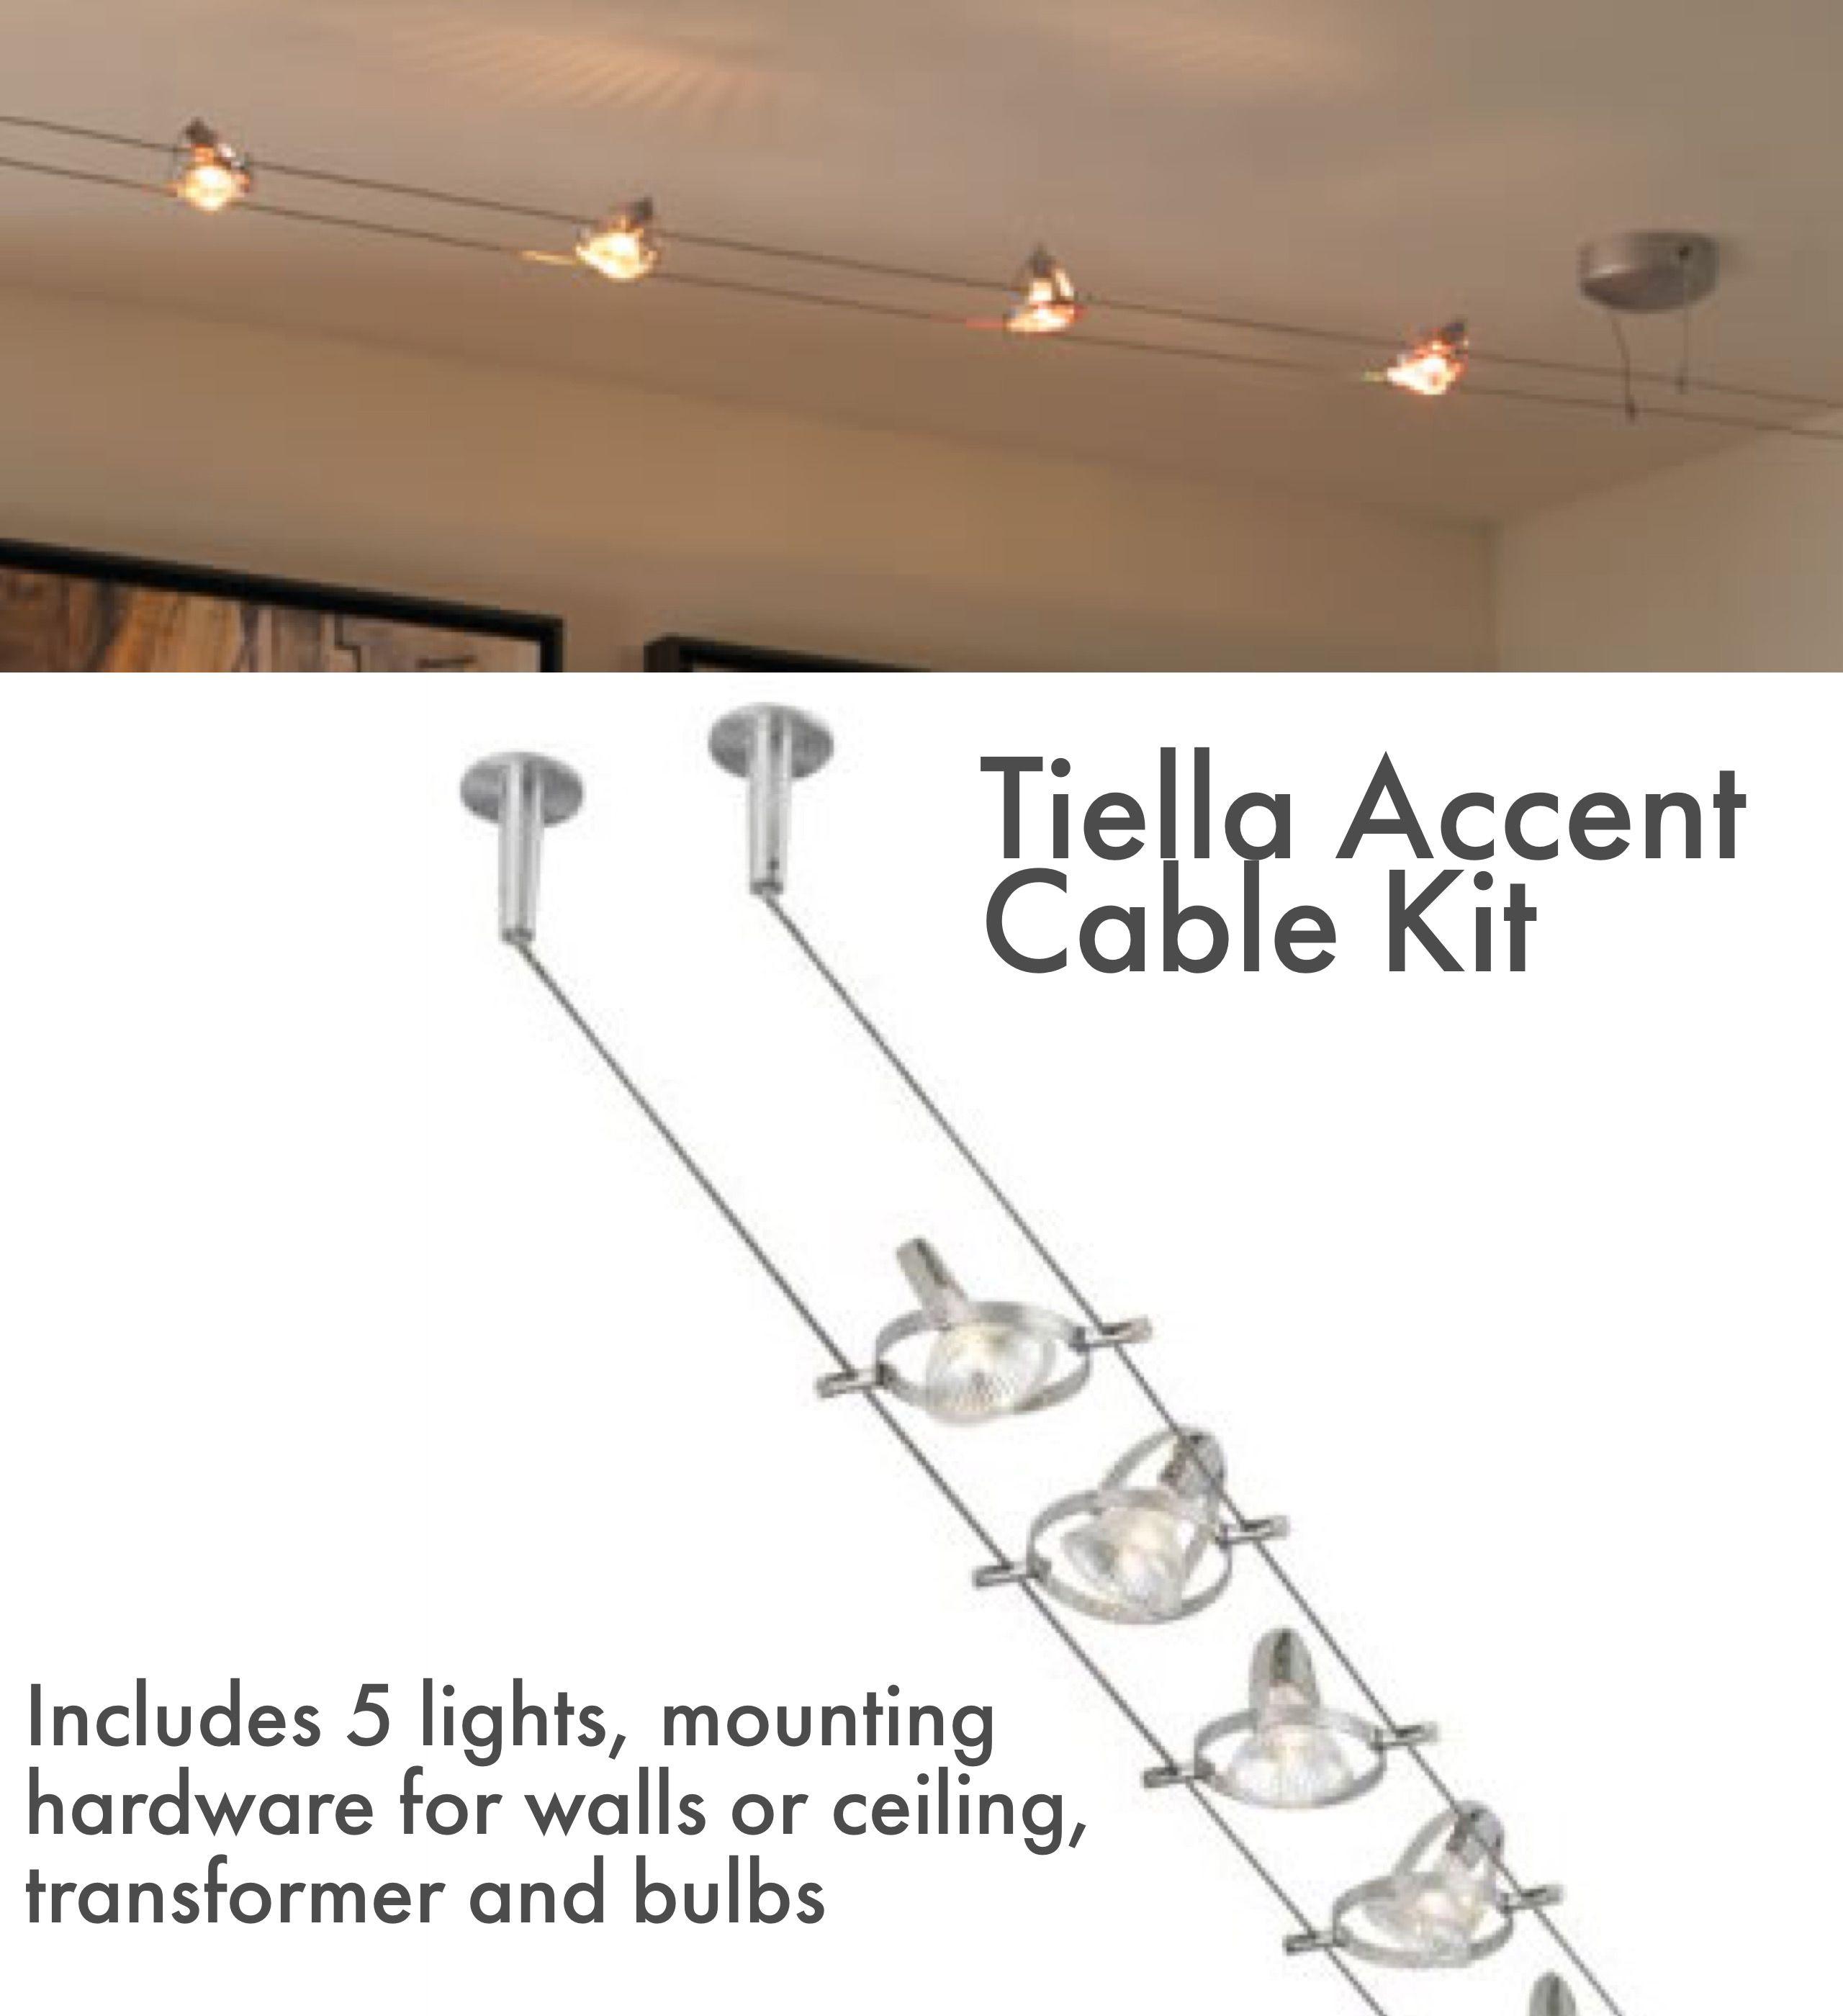 pabusti skaitiklis saveika cable lighting kit